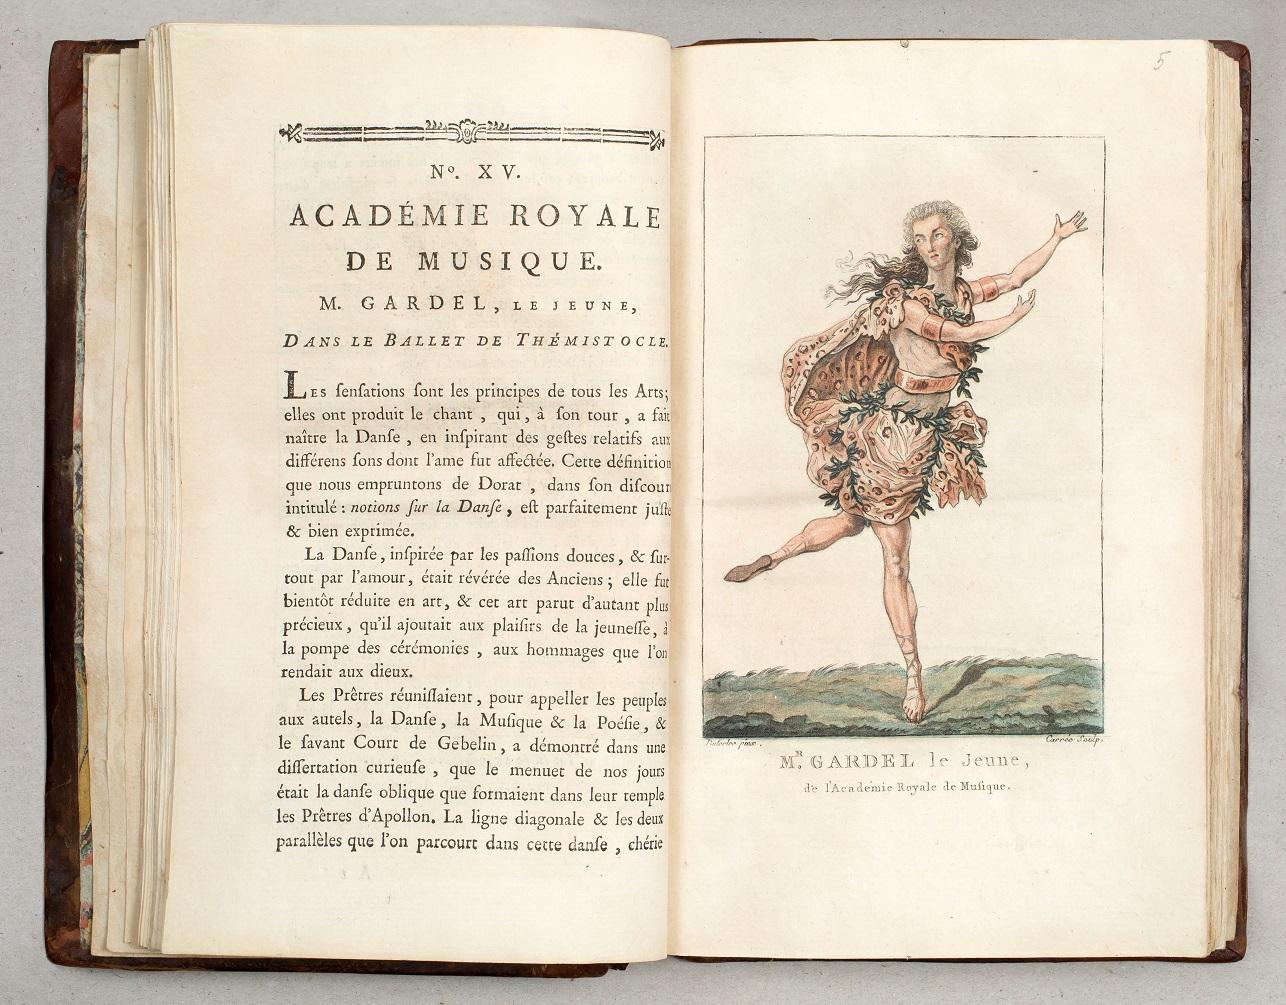 Costumes des grands théatres de Paris. № 37‒48. – Paris, 1786.